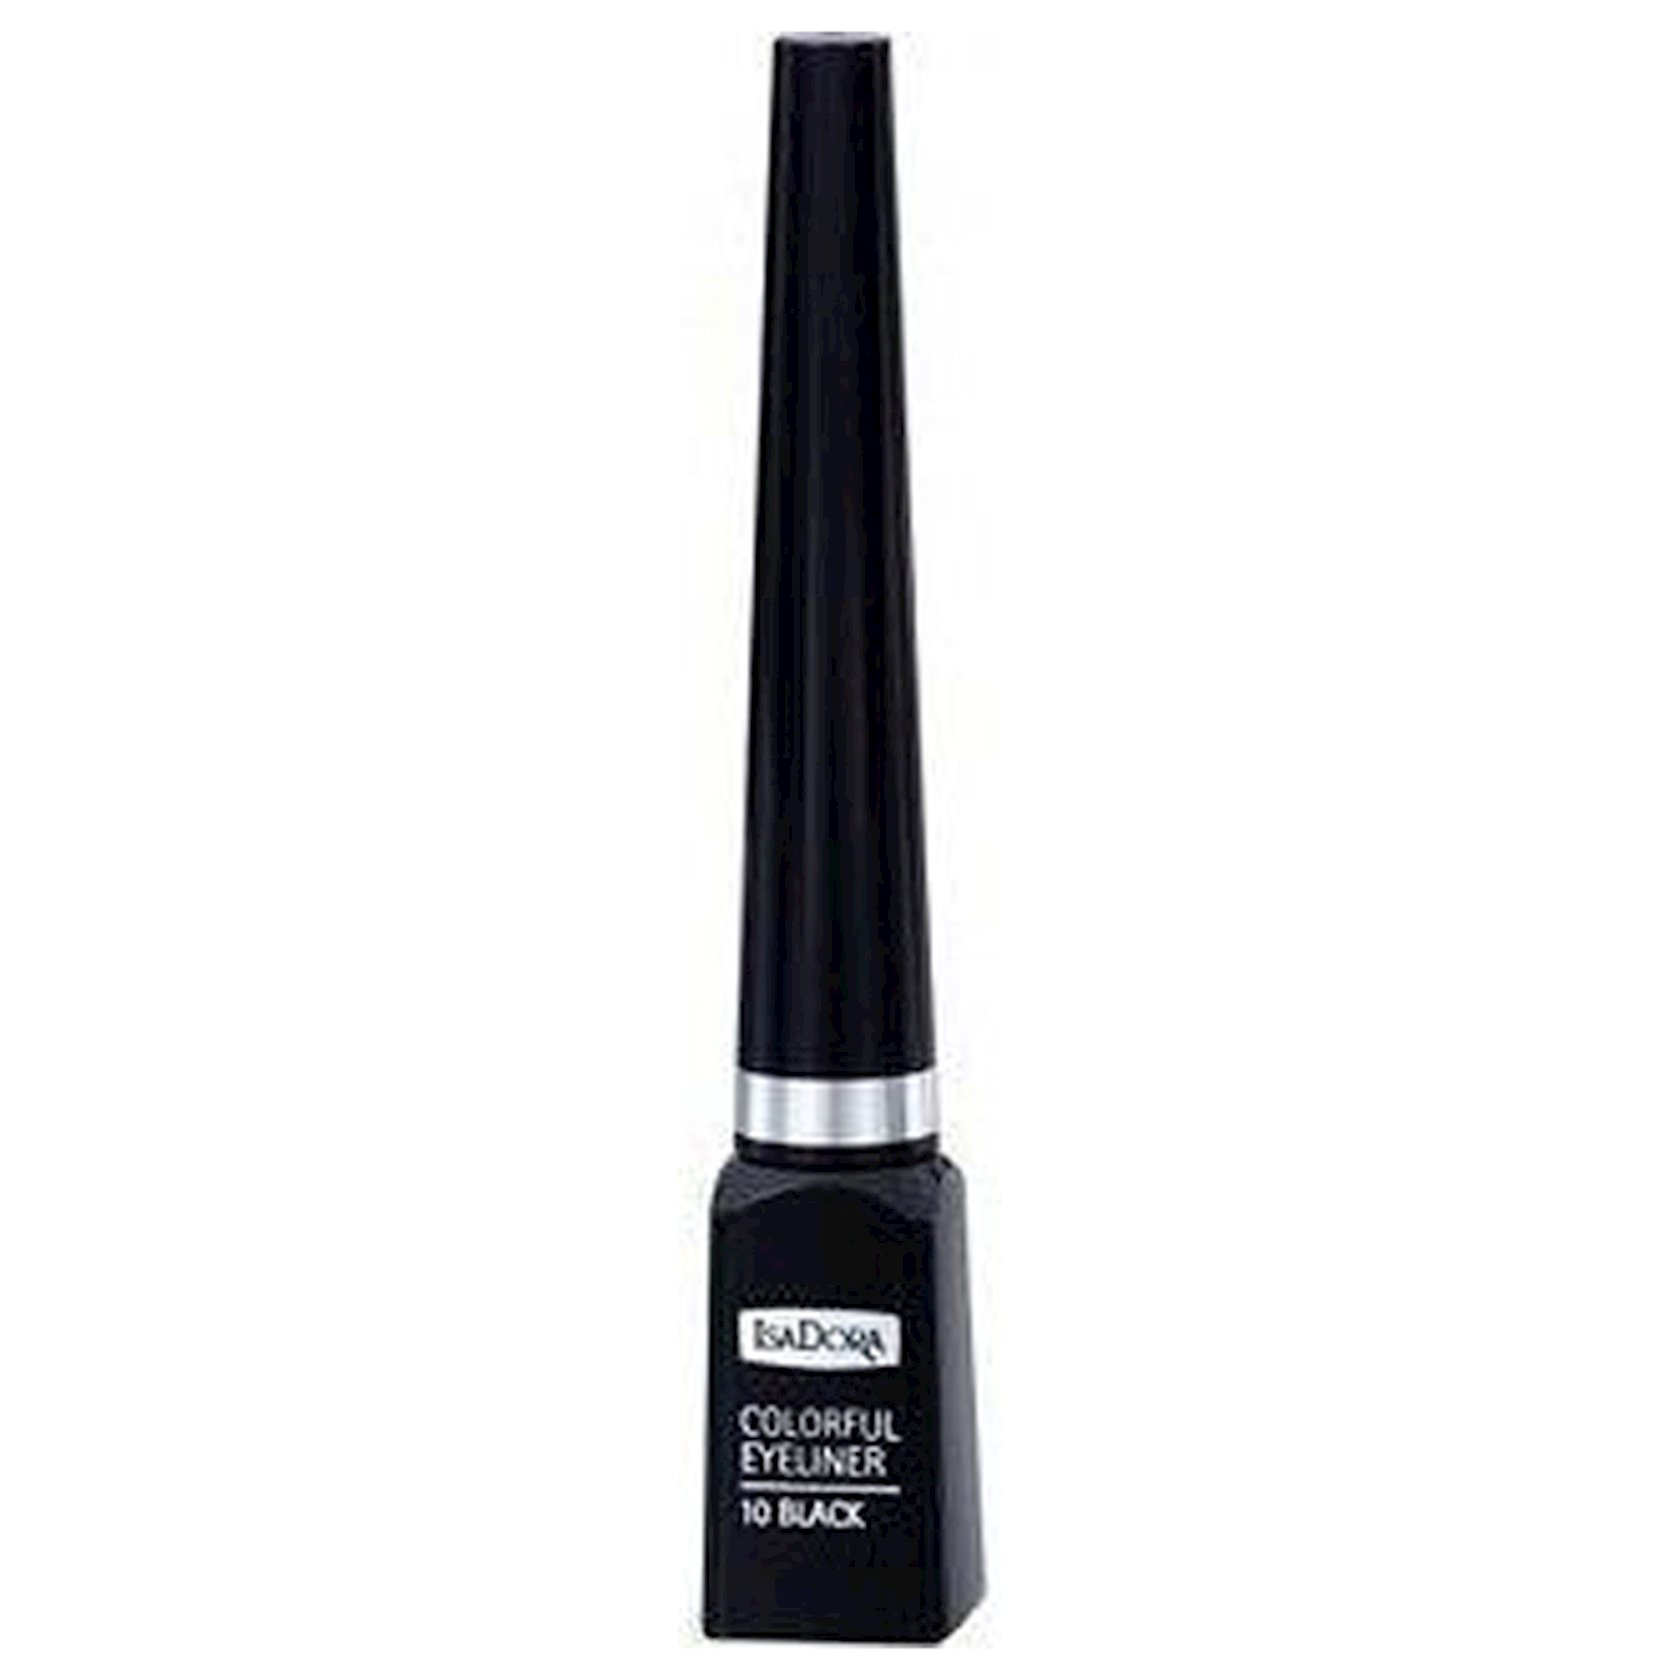 Göz layneri IsaDora Colorful Eyeliner №10 Black 3.7 ml